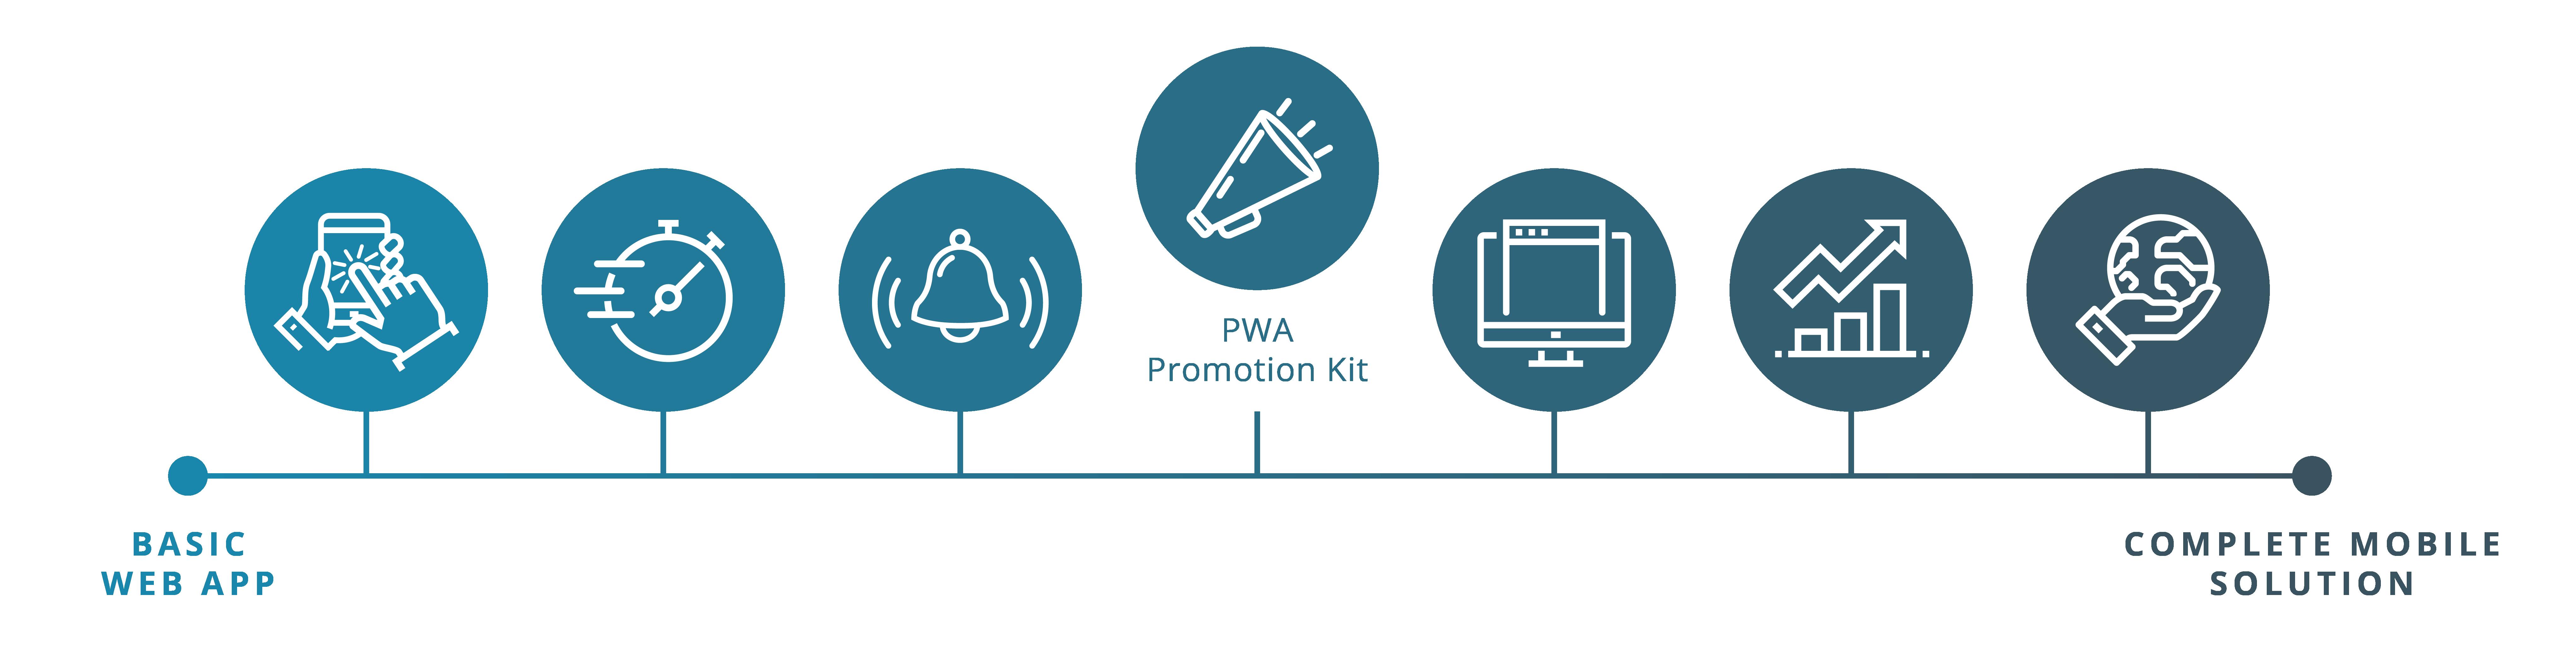 pwa-promote